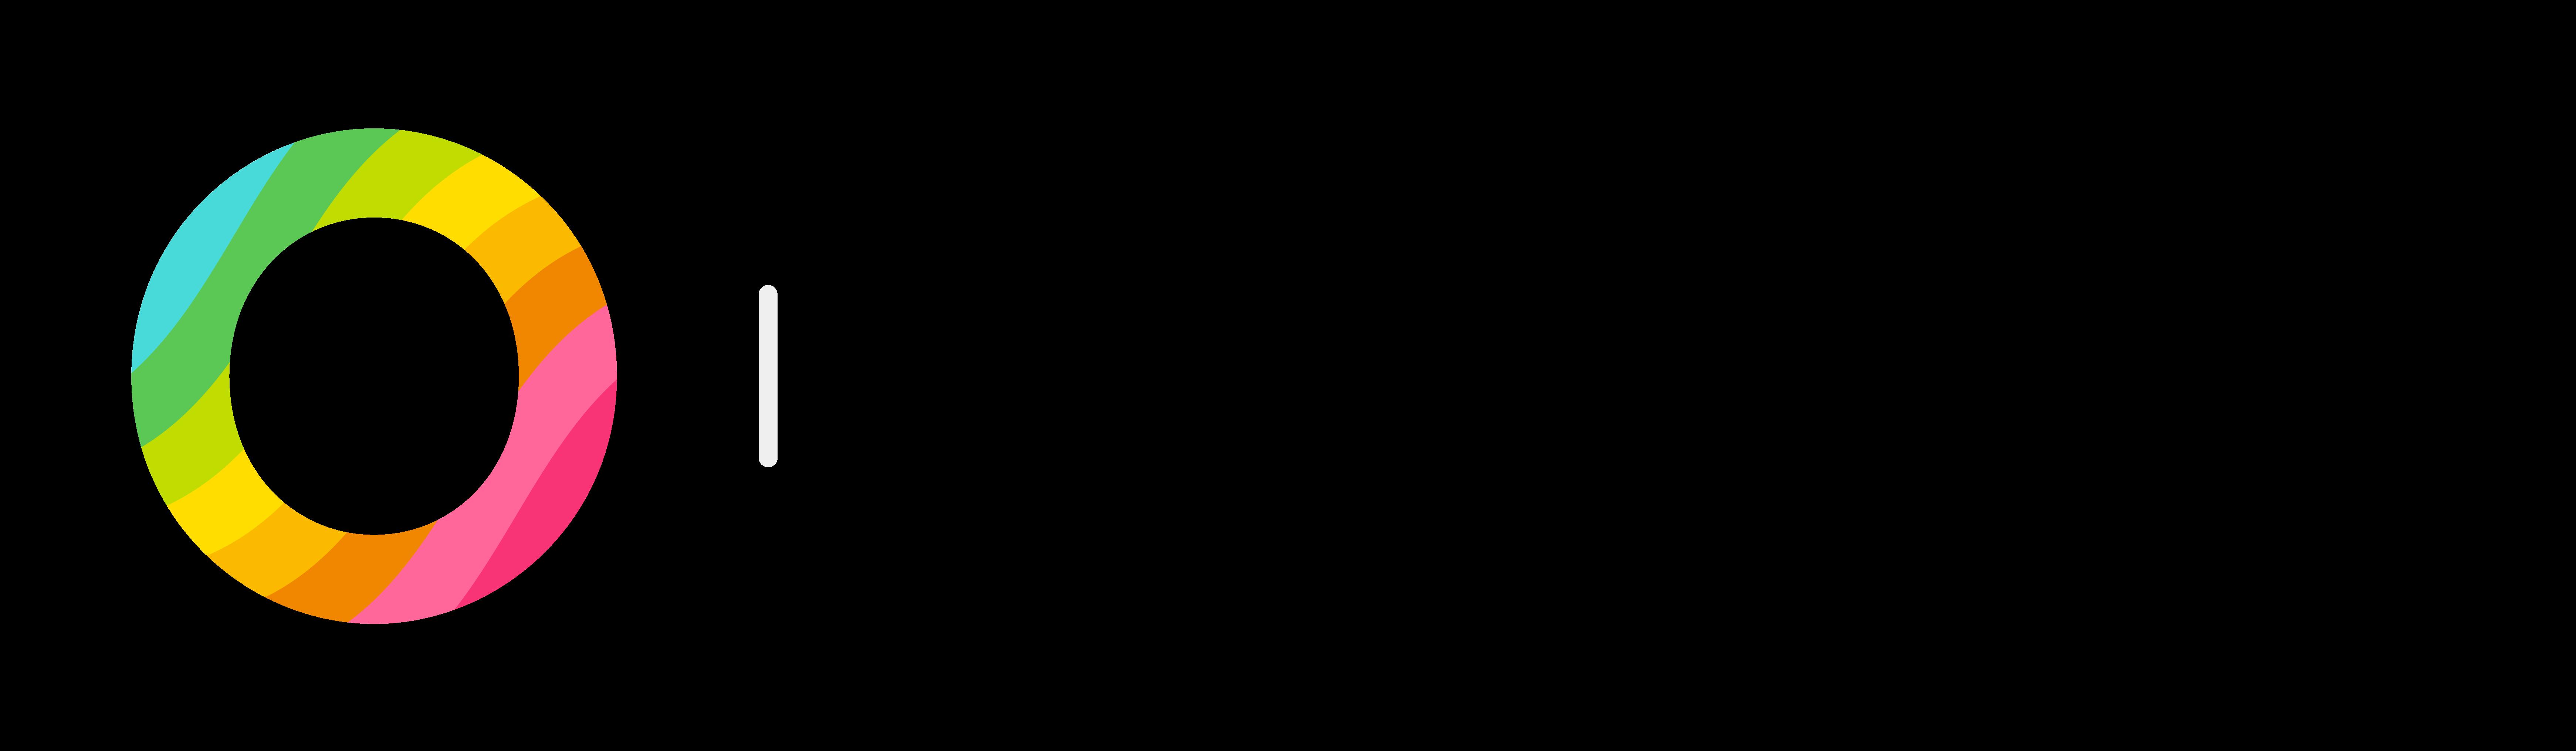 Okuna logo